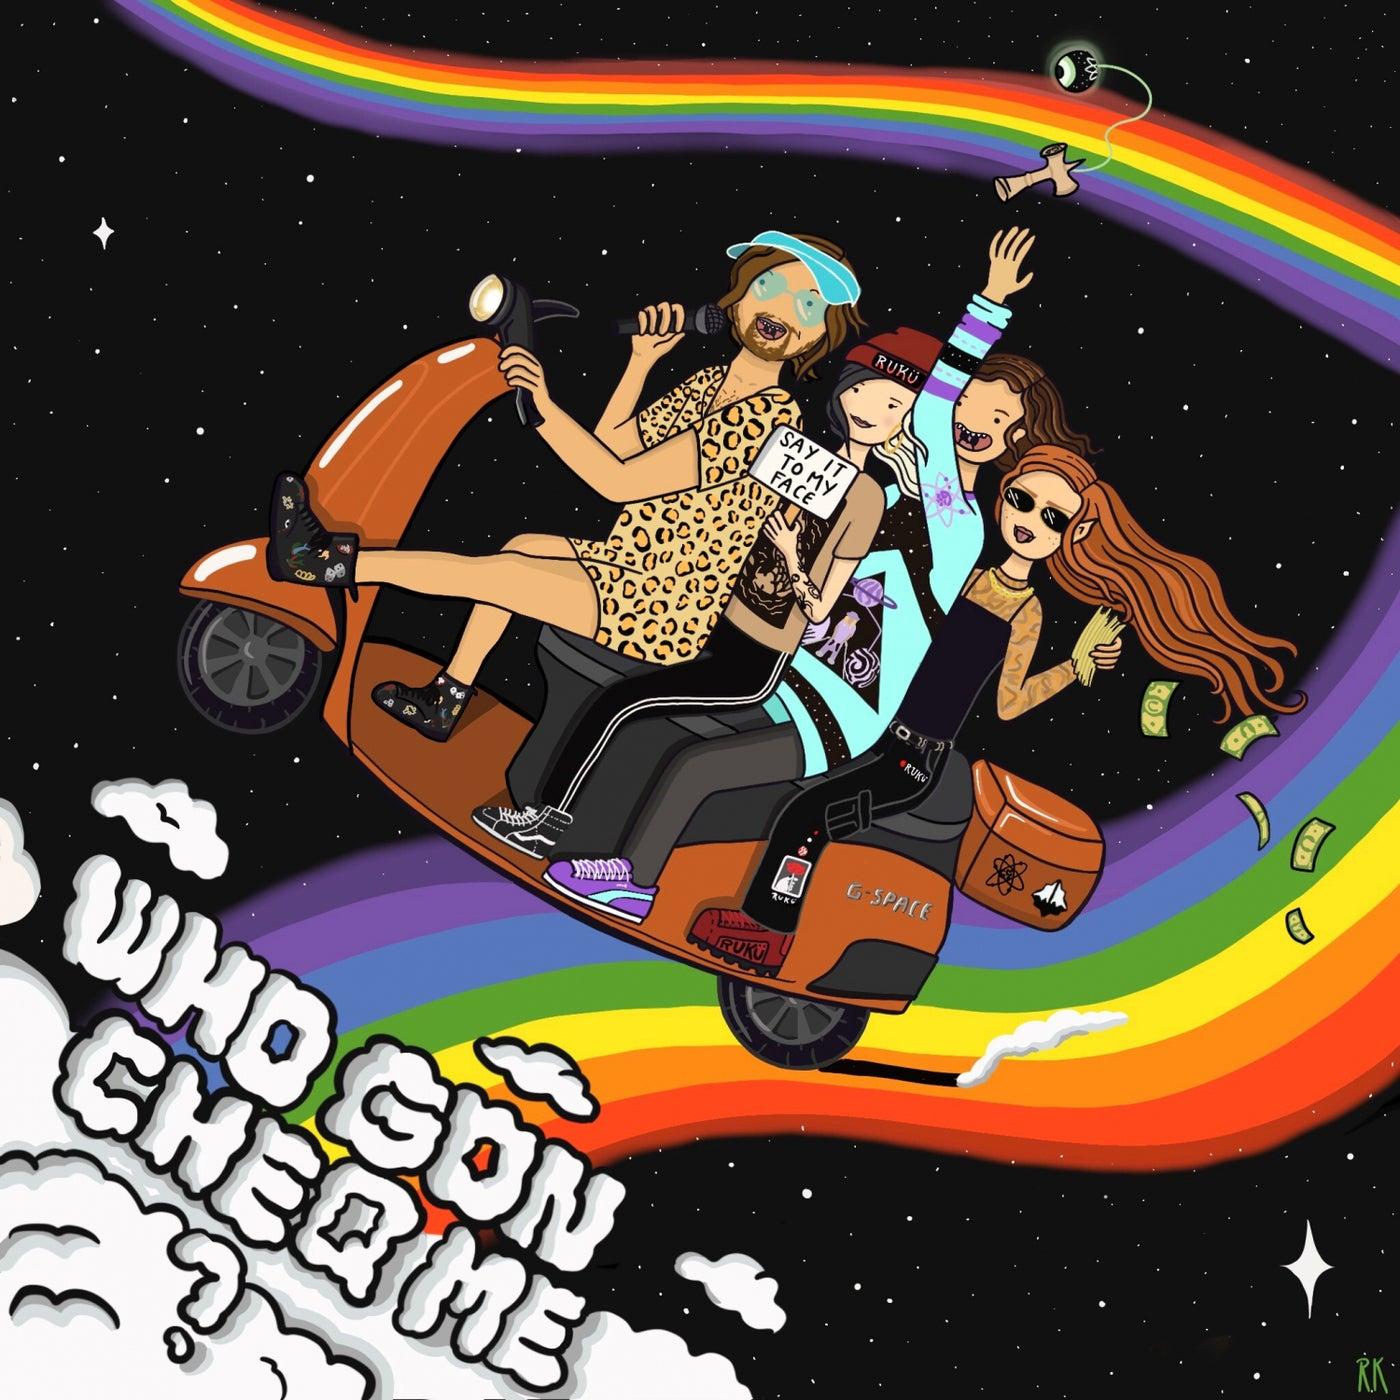 WHO GON CHEQ ME (feat. Ruku & lysn.) (Original Mix)